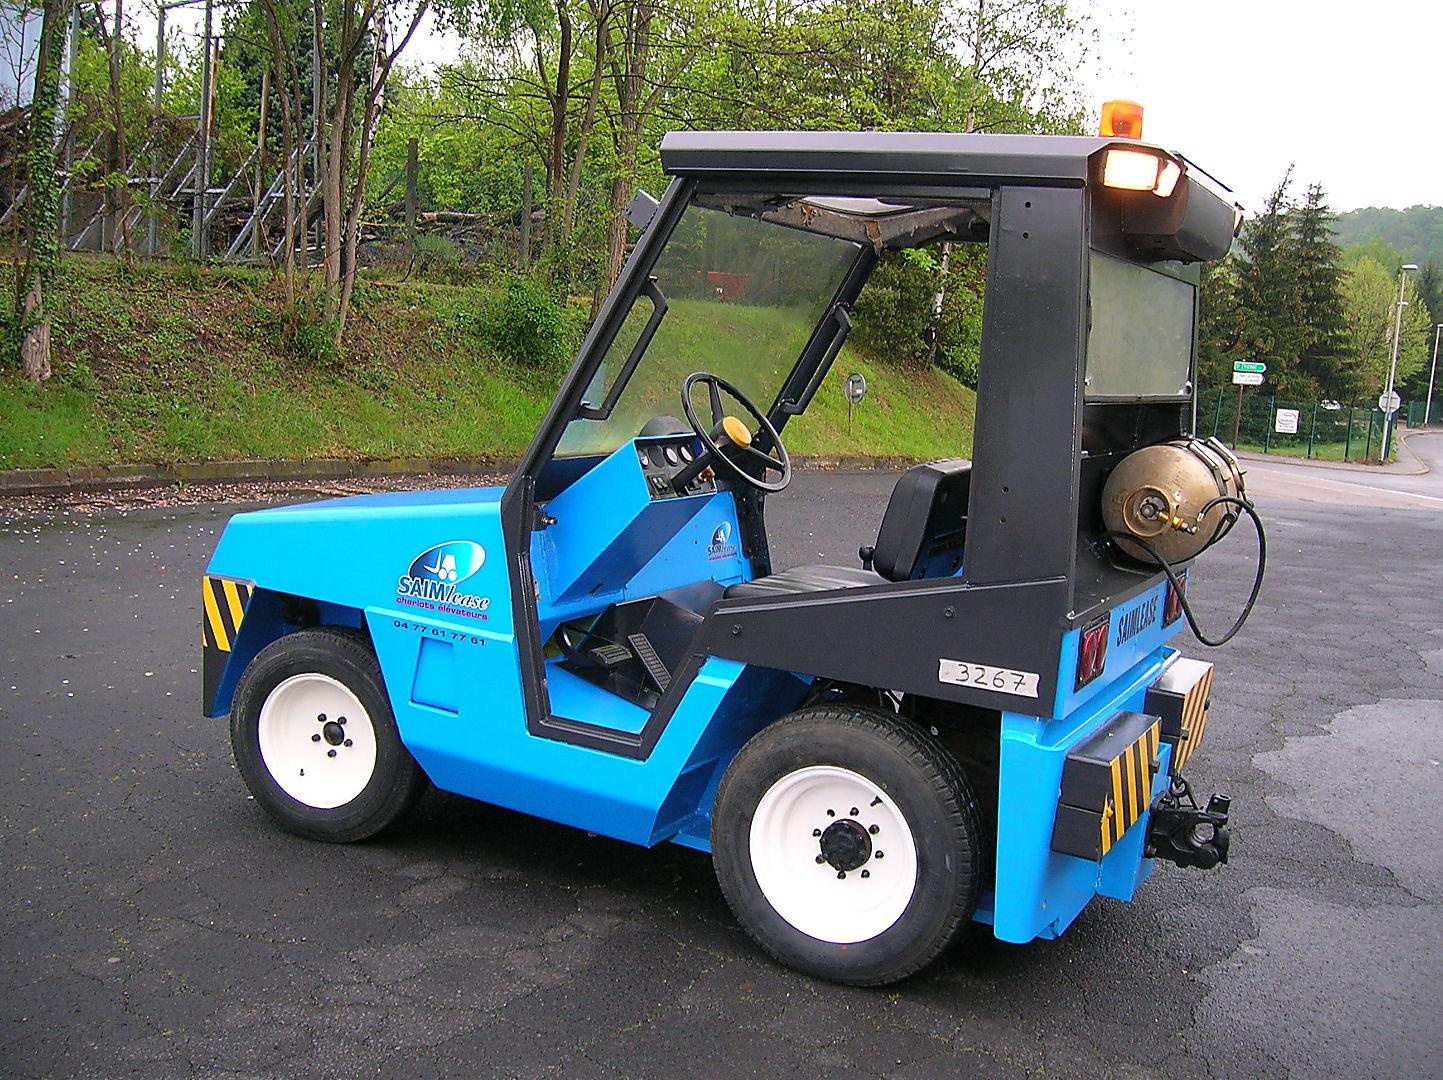 tracteur CLARK GT 30 LPG location vente neuf ou occasion